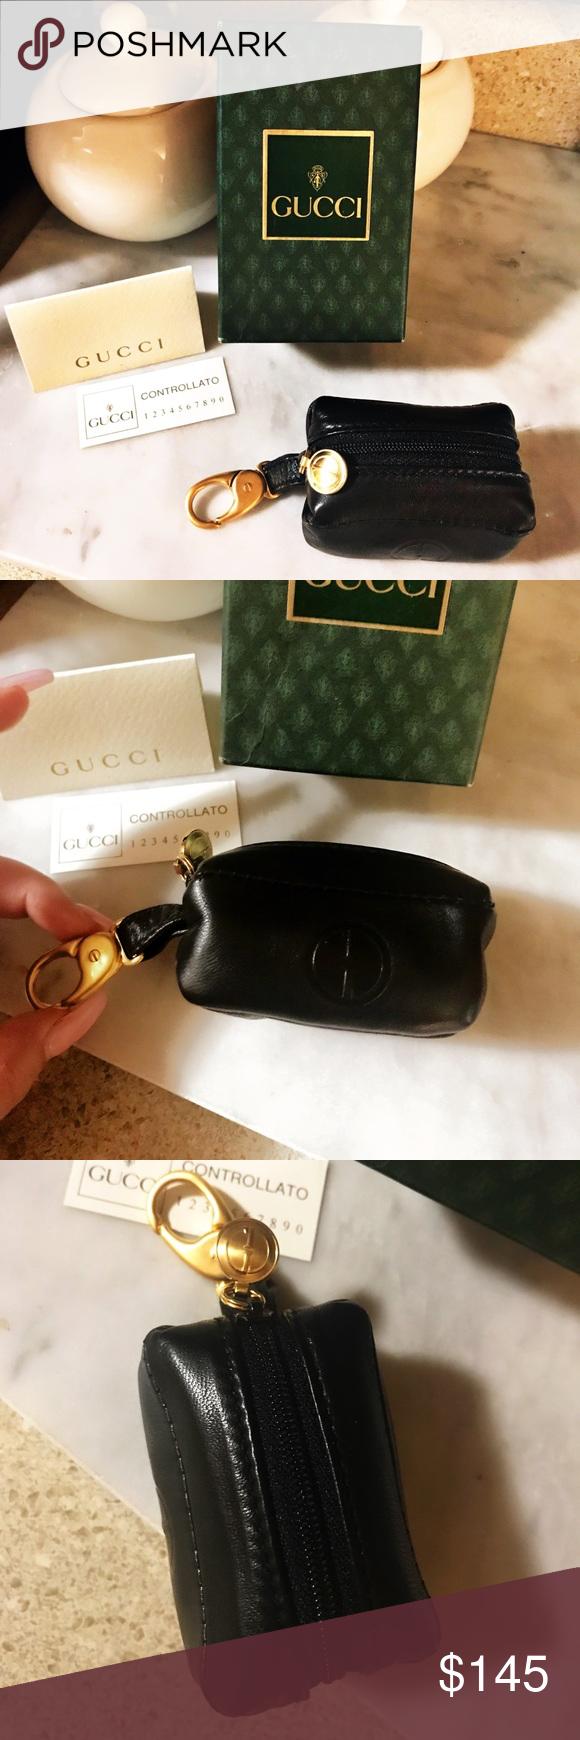 169594d6759 Gucci Rare GG Mini Coin Purse   Keychain Authentic Gucci Rare Vintage  Lambskin Coin